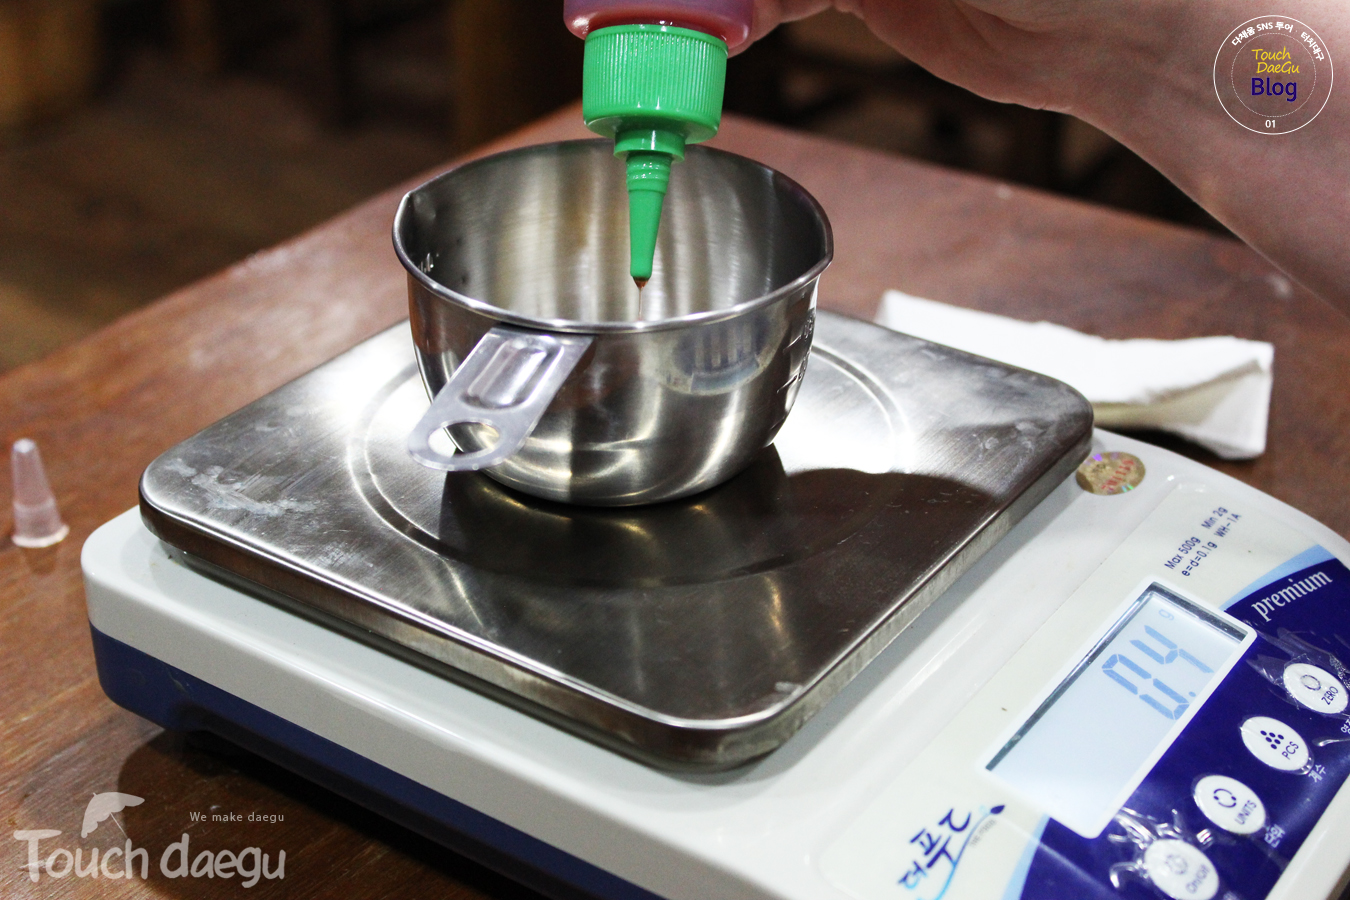 Measuring the ingredients